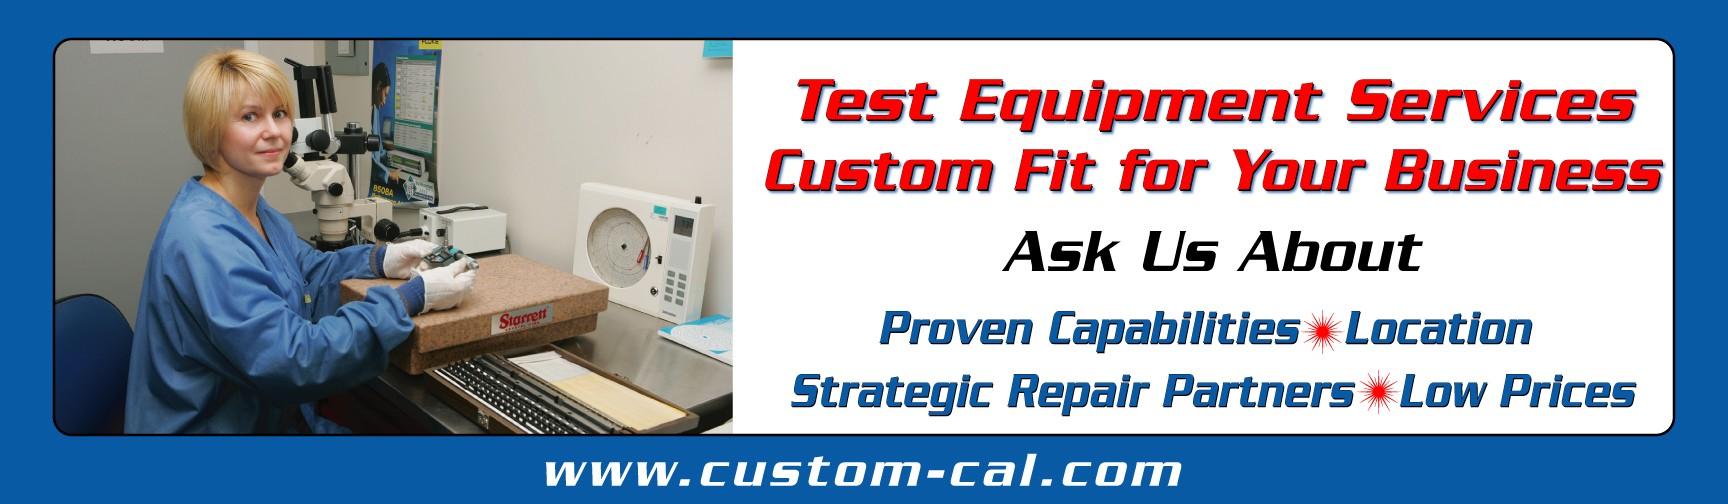 Custom Calibration dba:Custom-Cal | LinkedIn